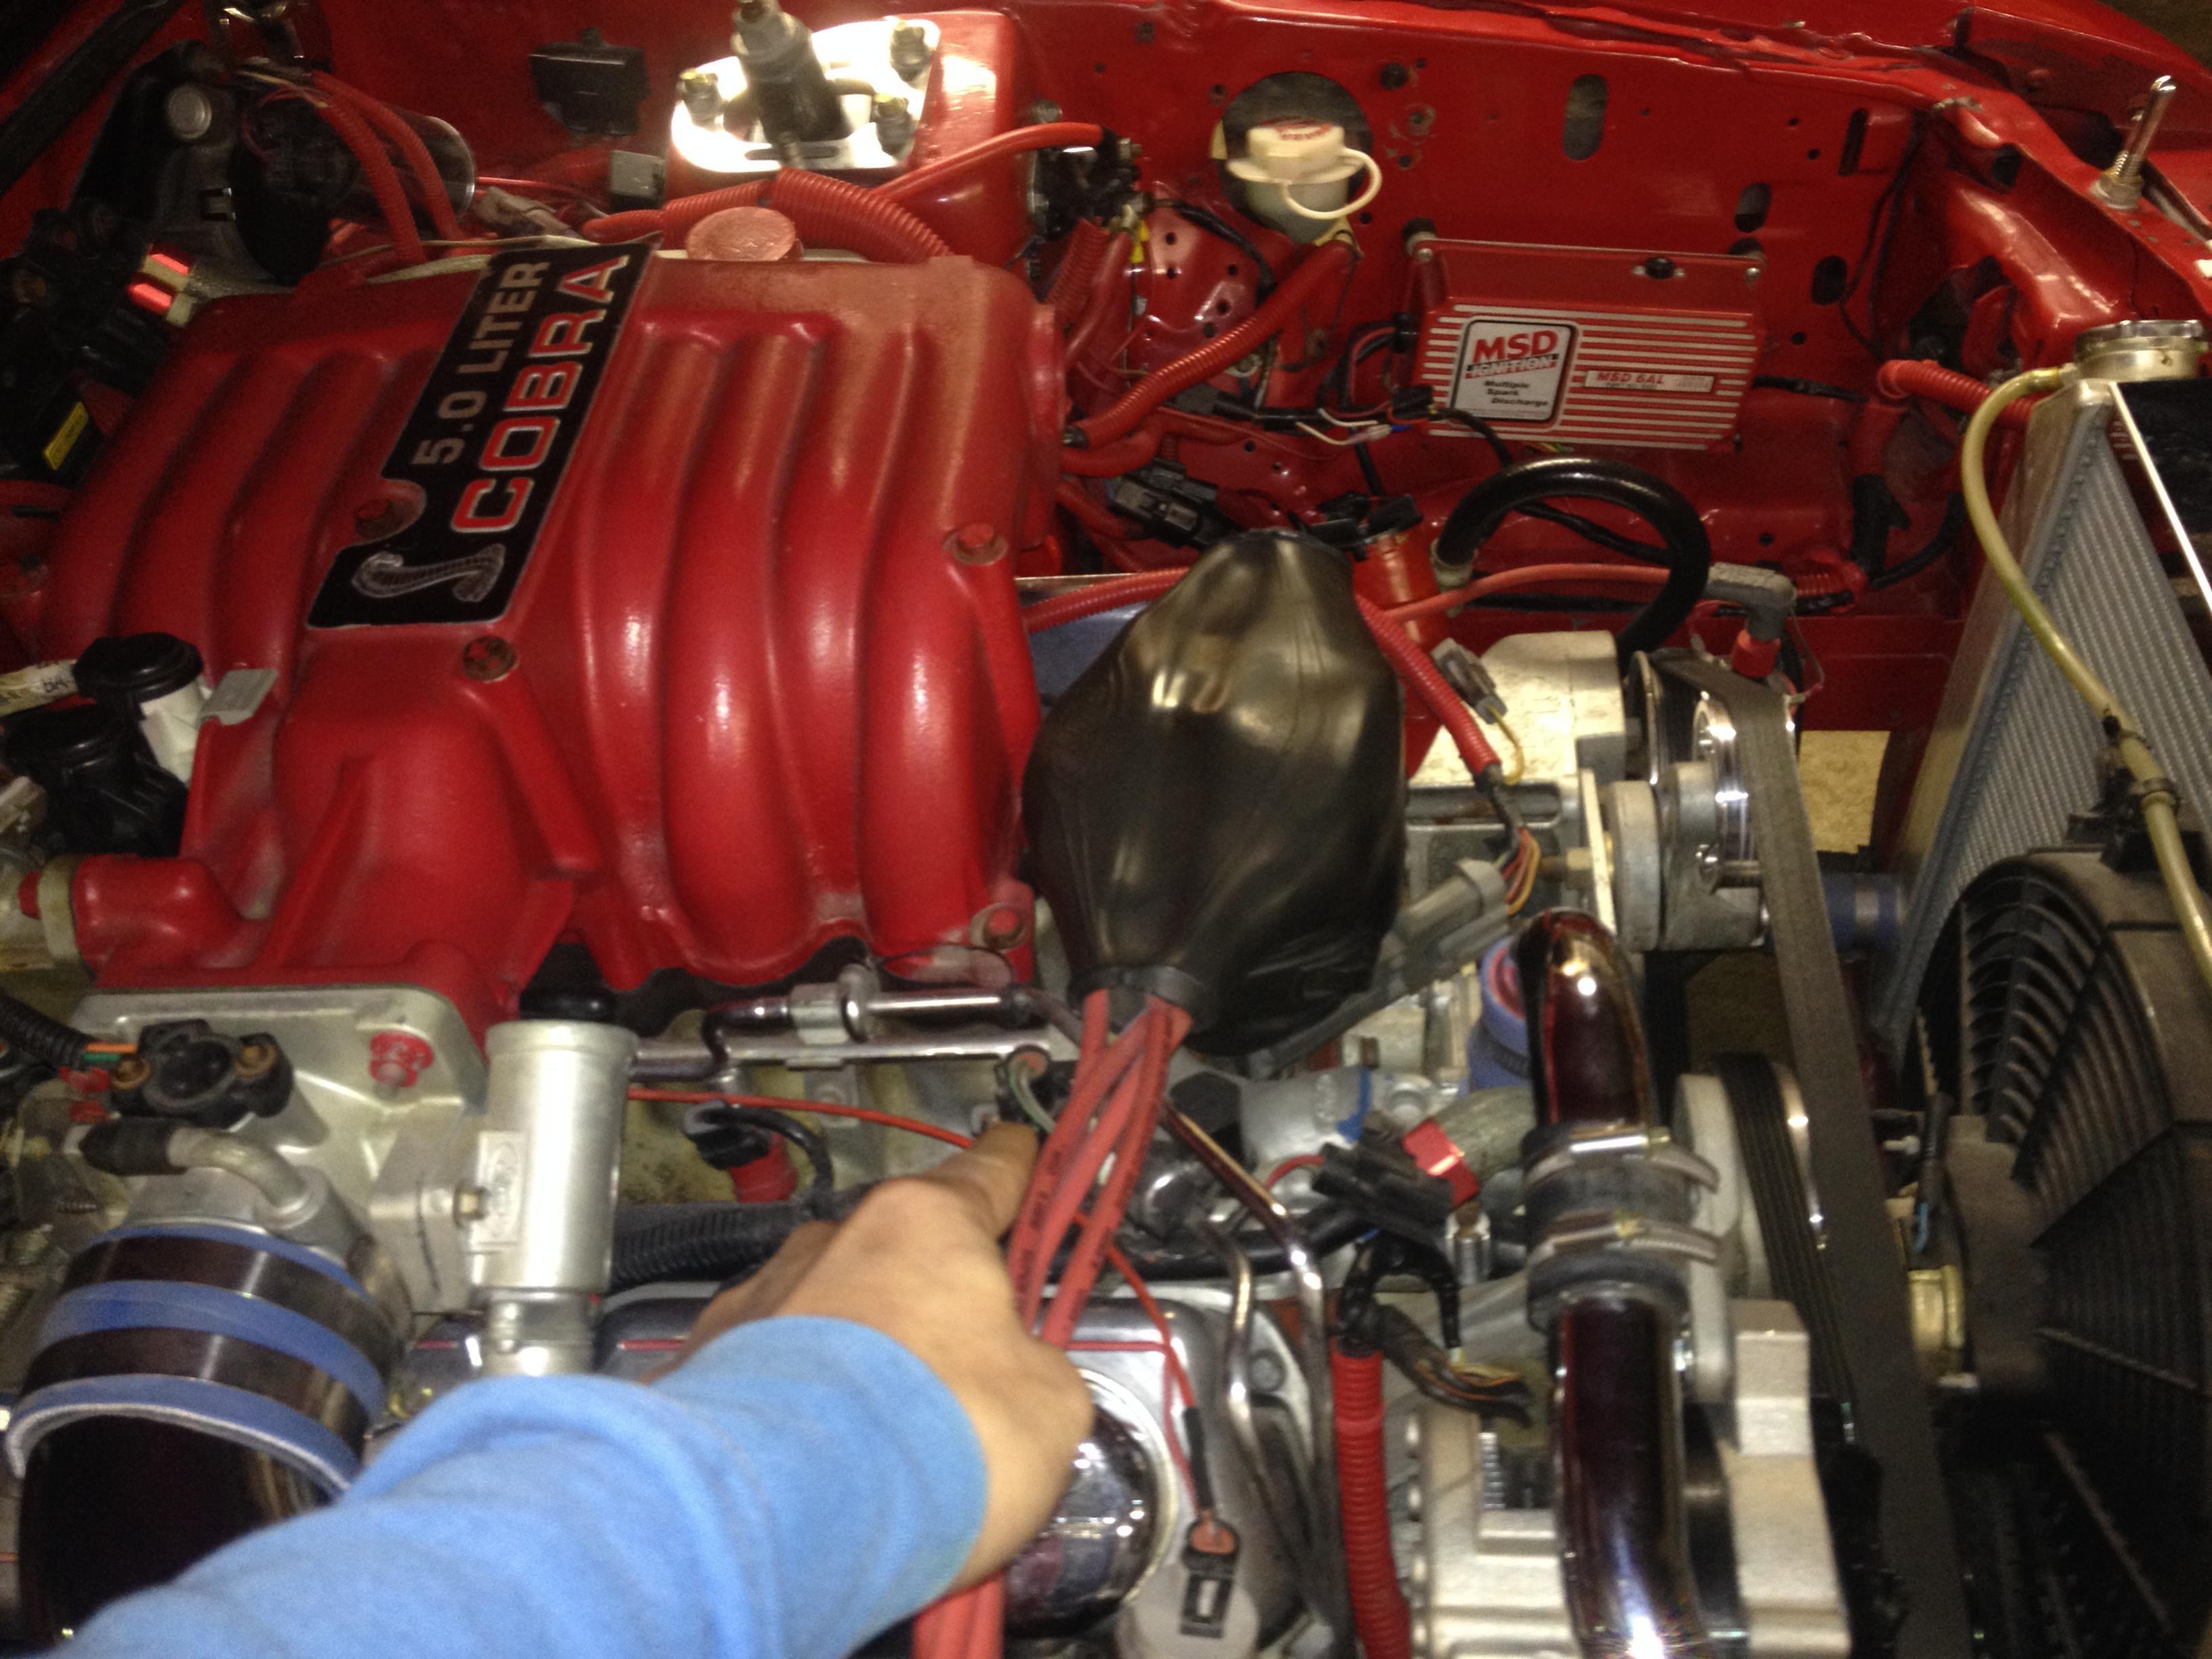 D Mustang Gt Bad Engine Coolent Temperature Sensor Location Photo on Mustang Coolant Temperature Sensor Location